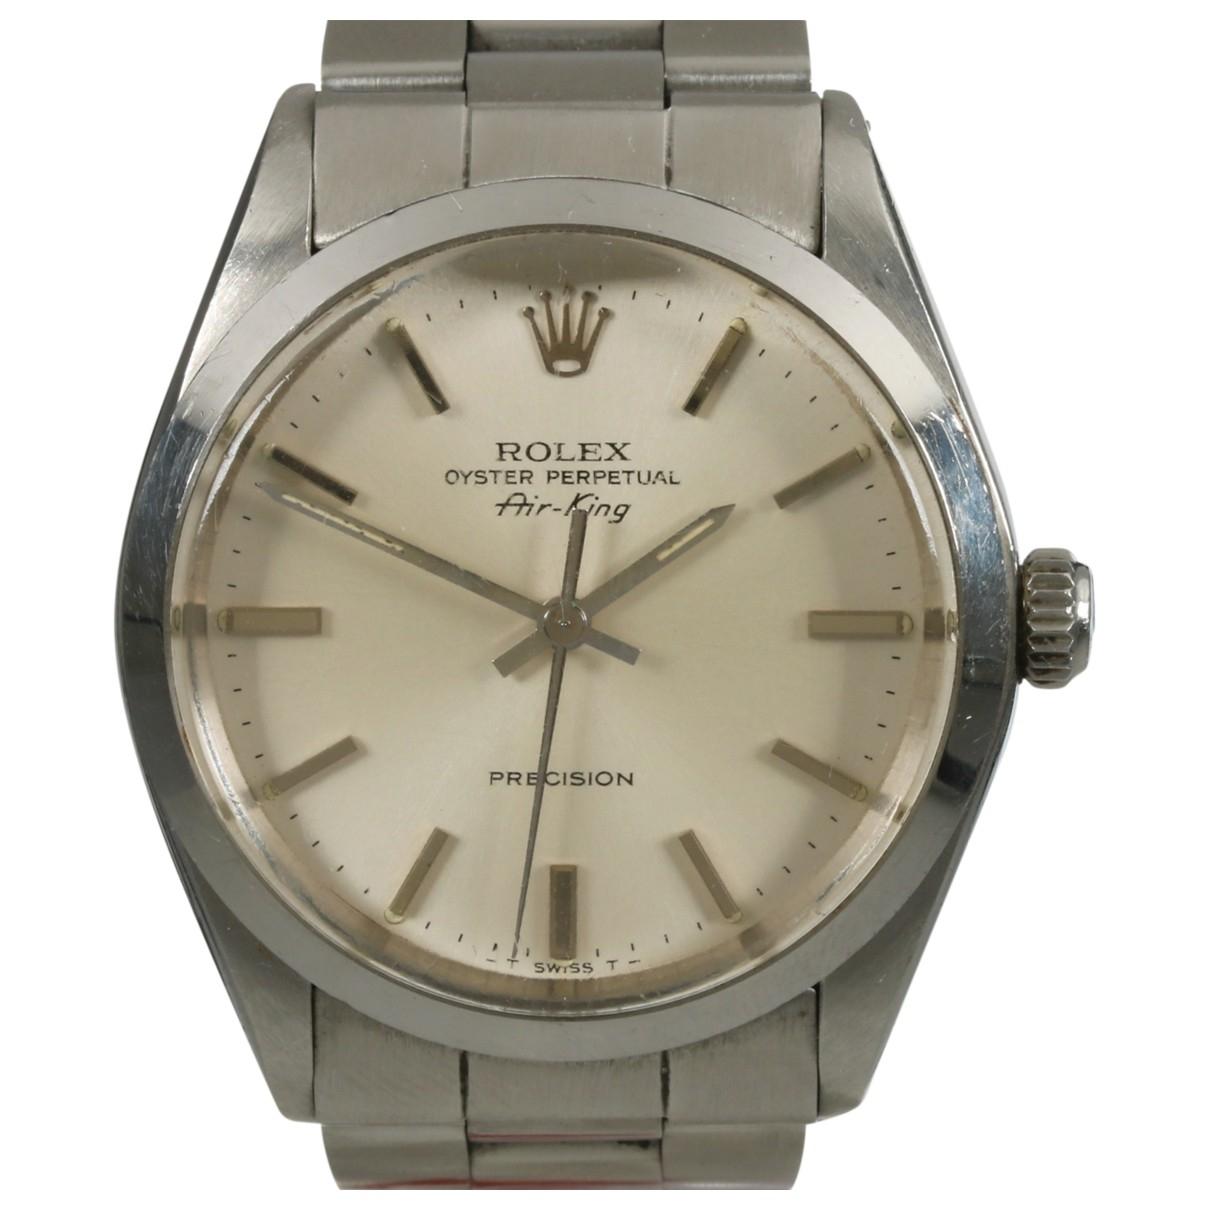 Relojes Air King Rolex